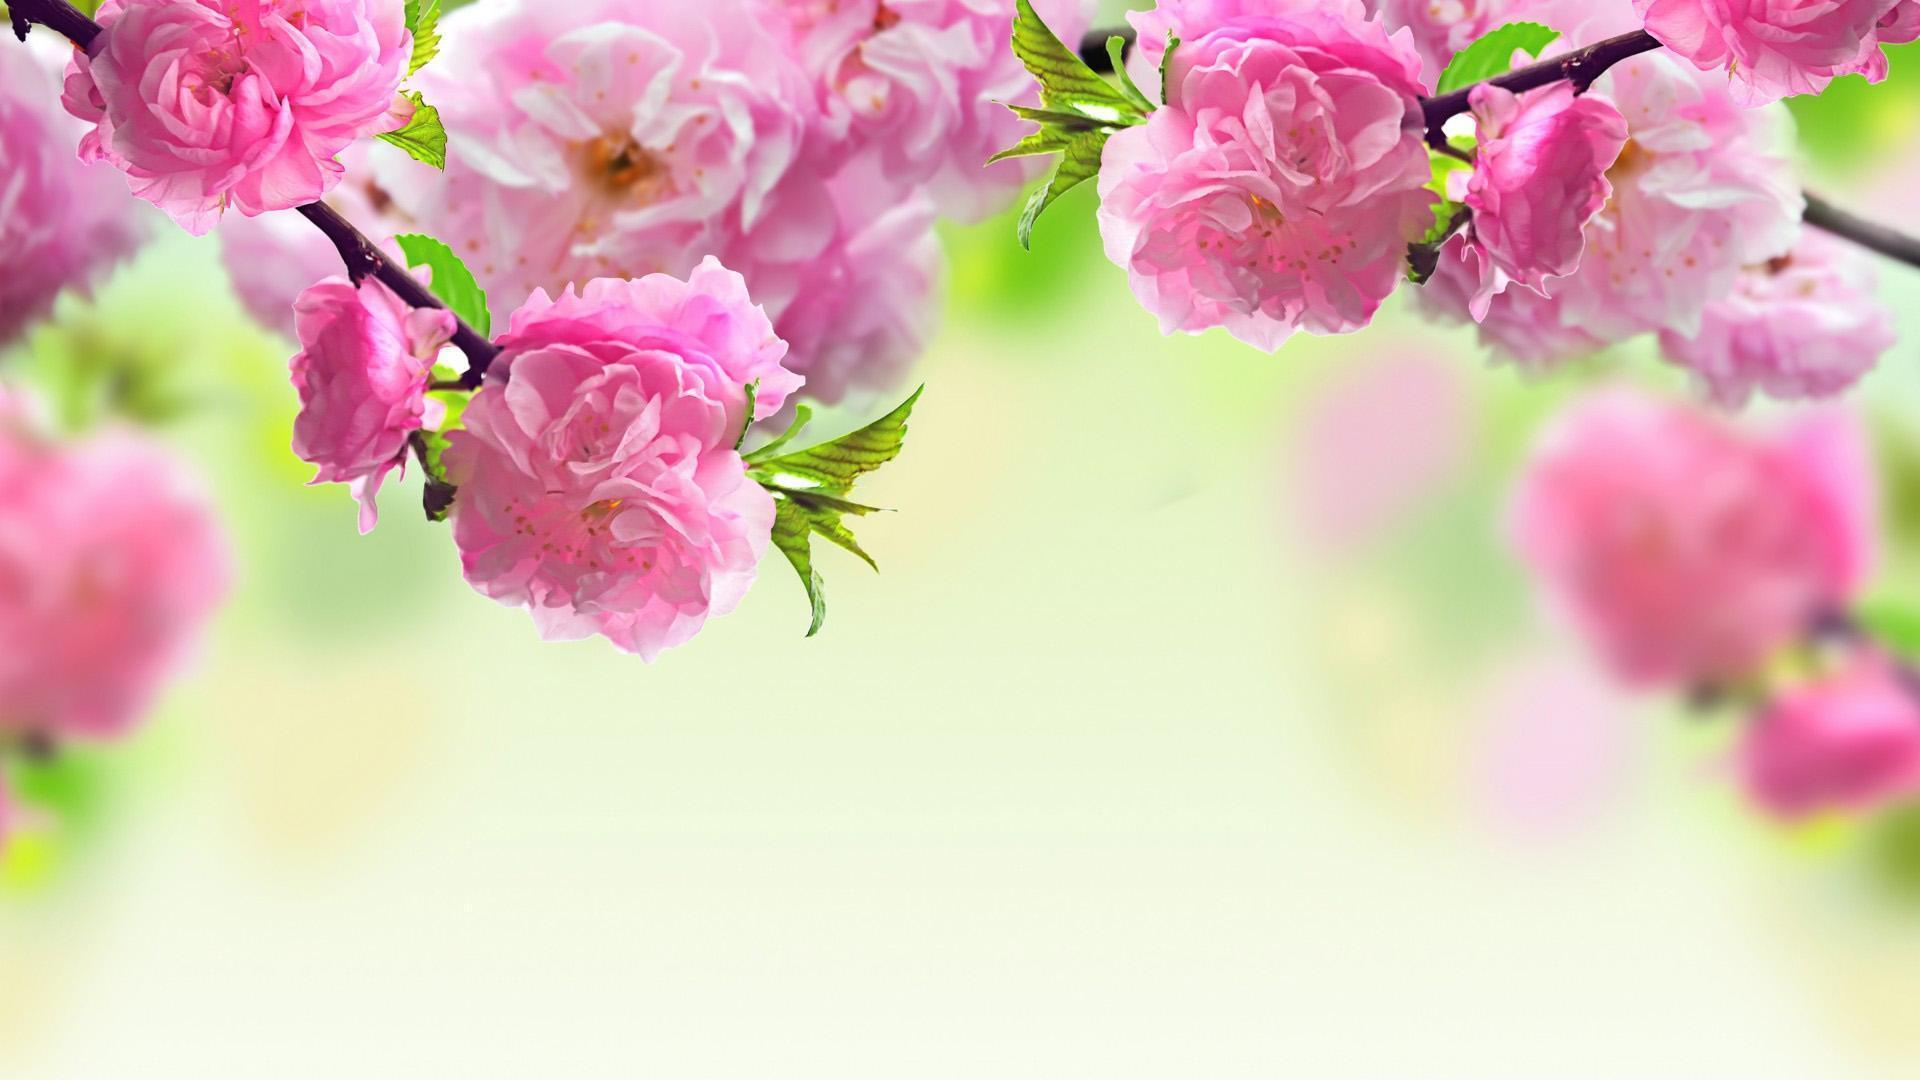 Spring Wallpaper hd download